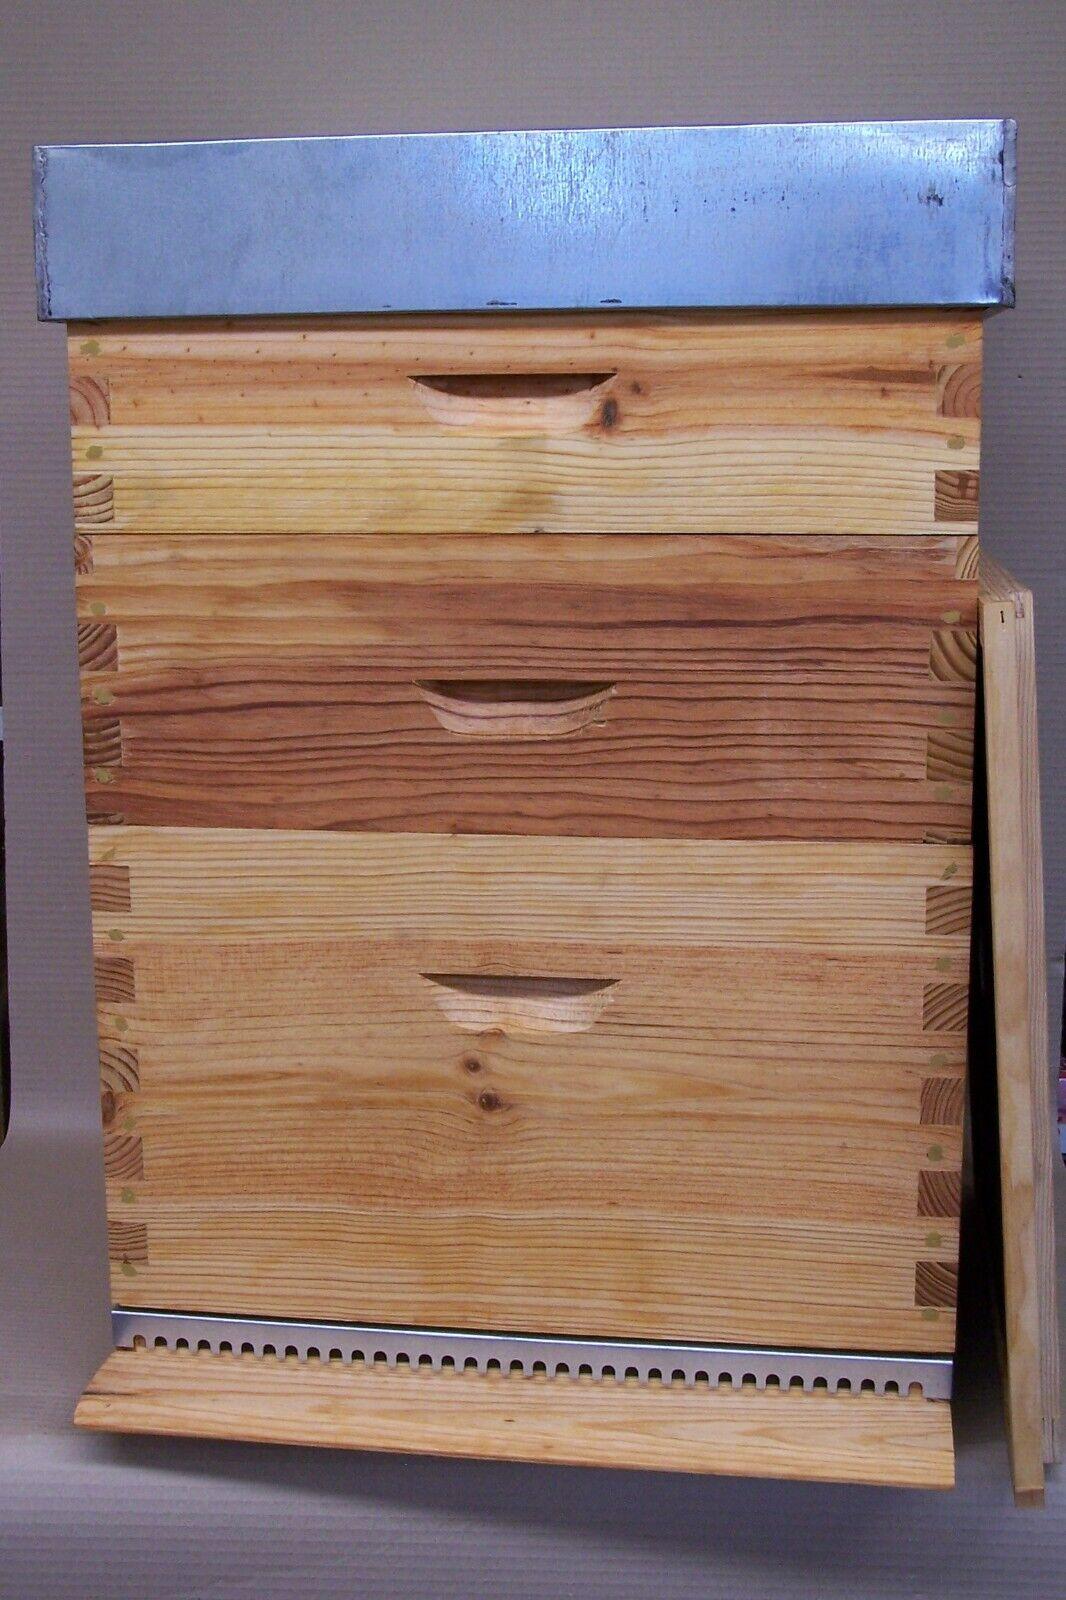 Innendeckel Dadant Bienenbeute Bienenstock